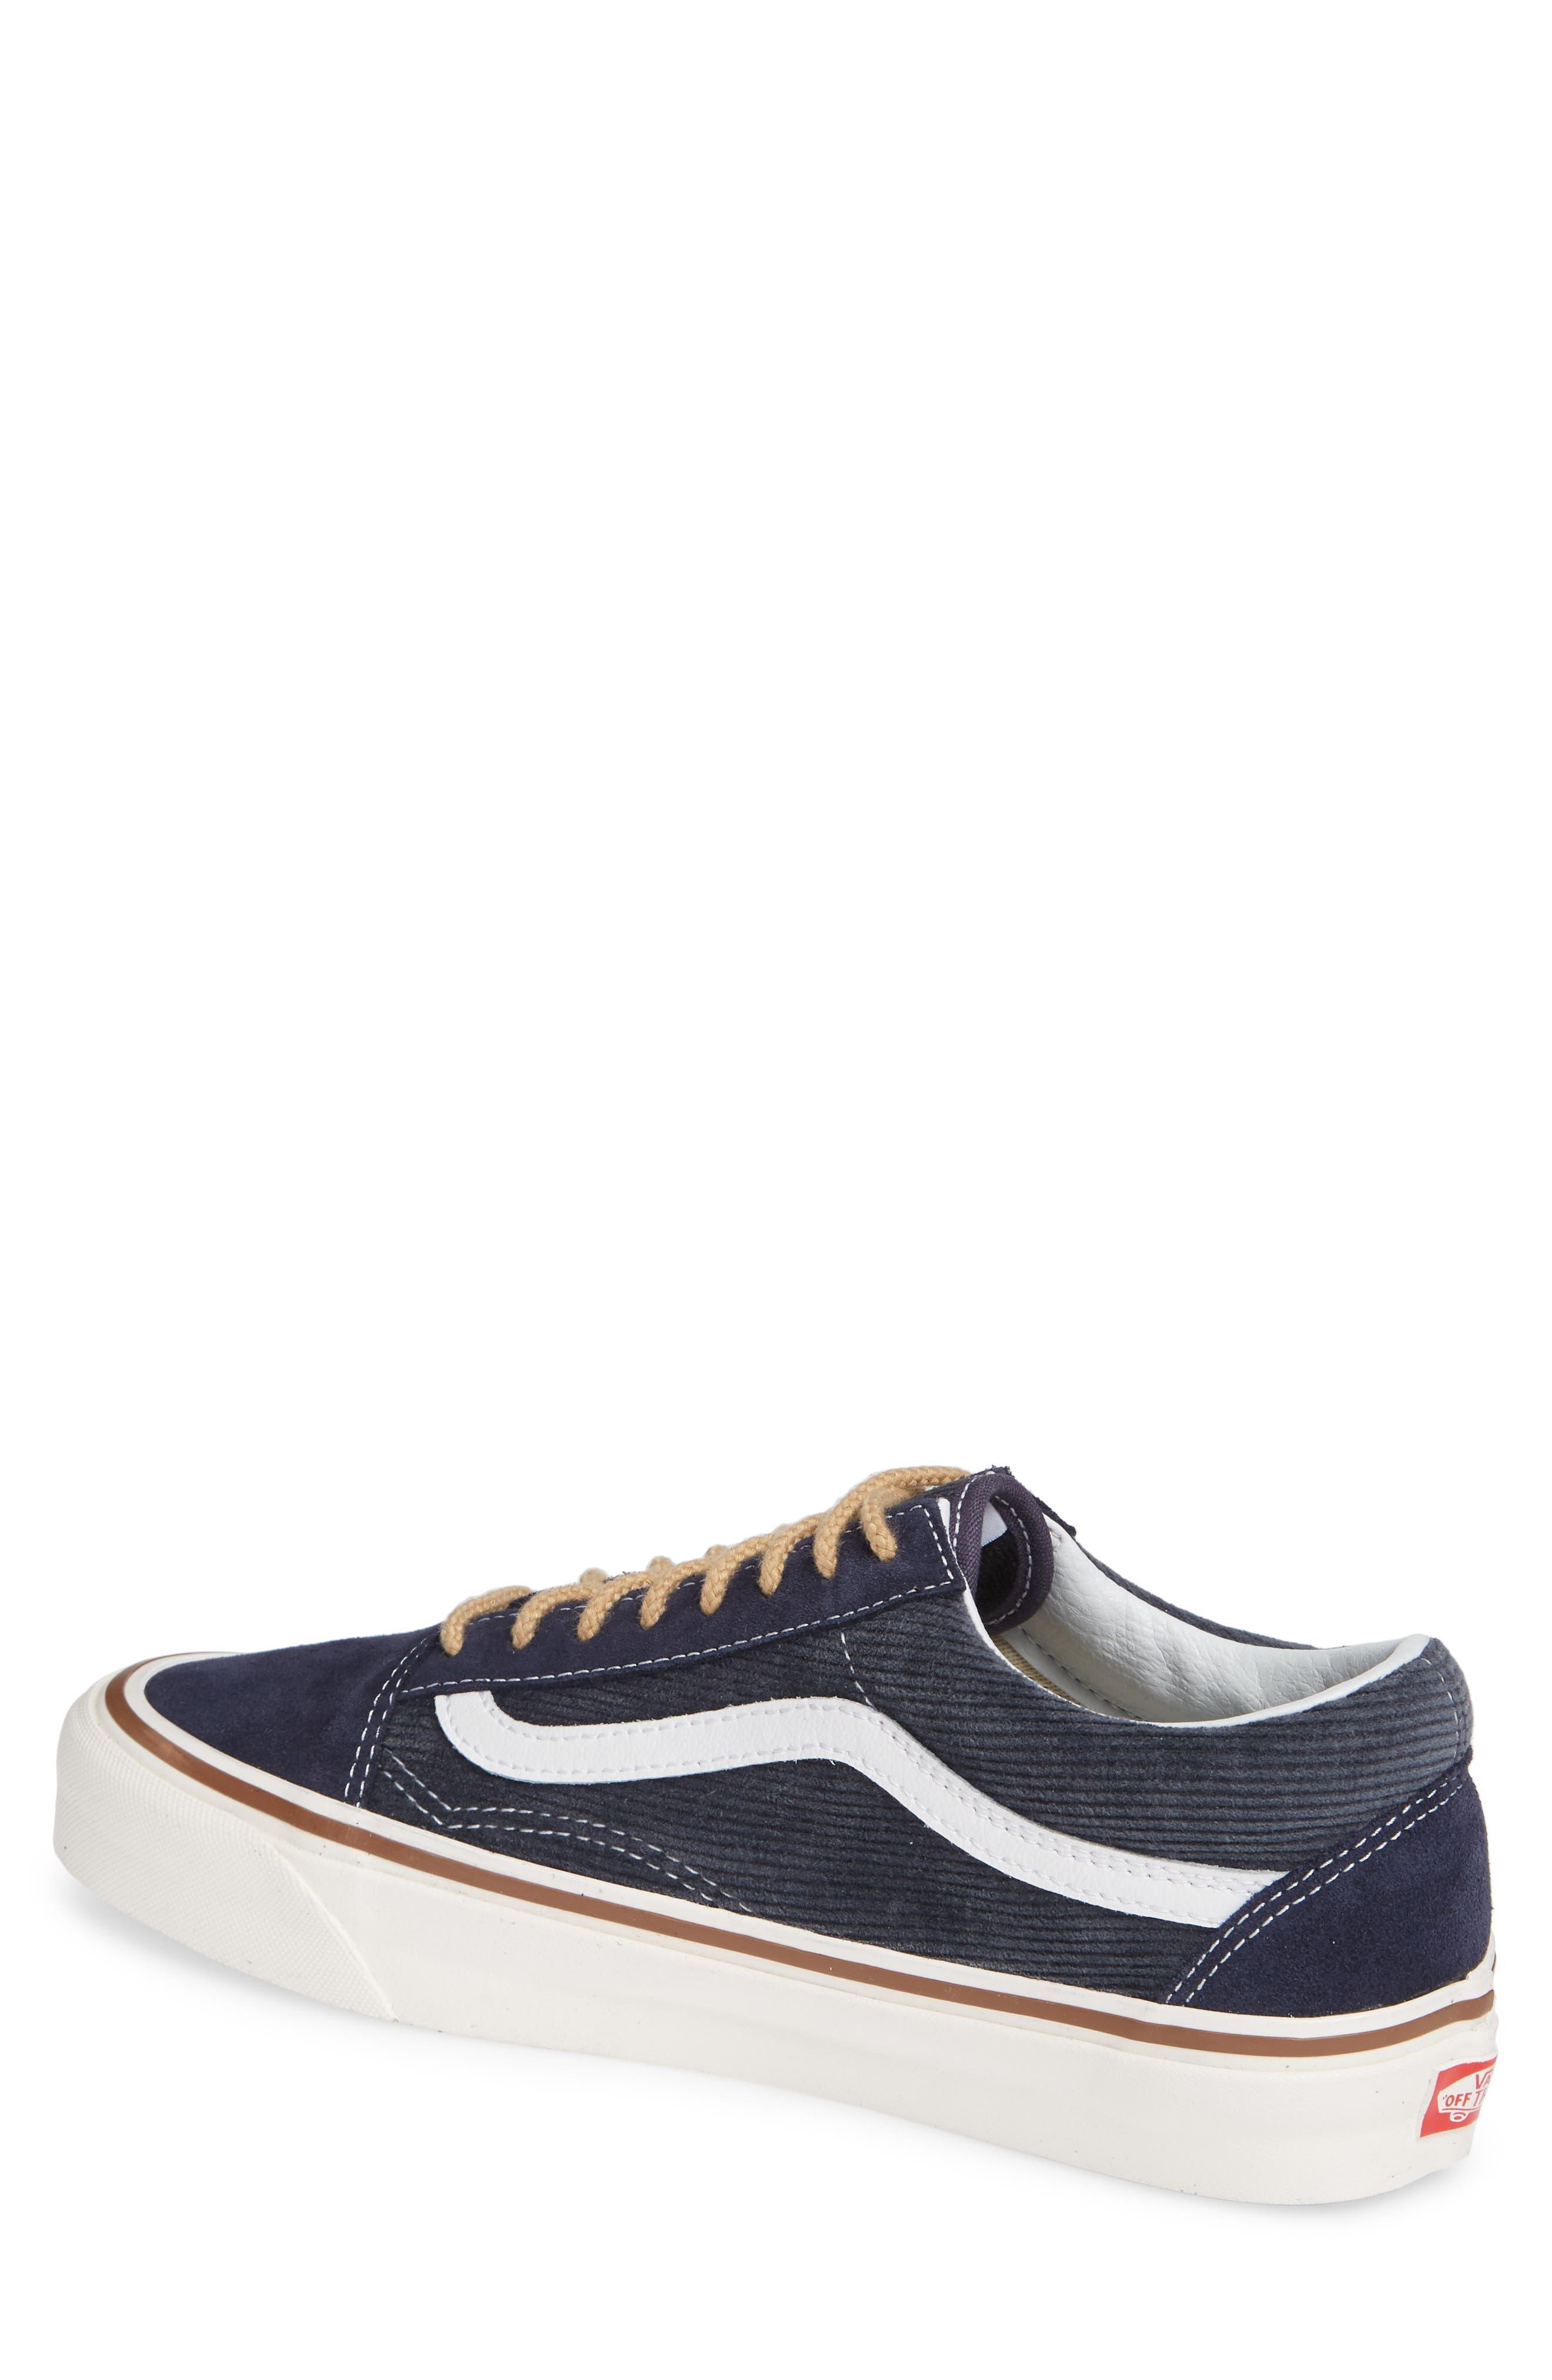 Anaheim Factory Old Skool 36 DX Sneaker,                             Alternate thumbnail 2, color,                             NAVY/ SUEDE/ CORDUROY